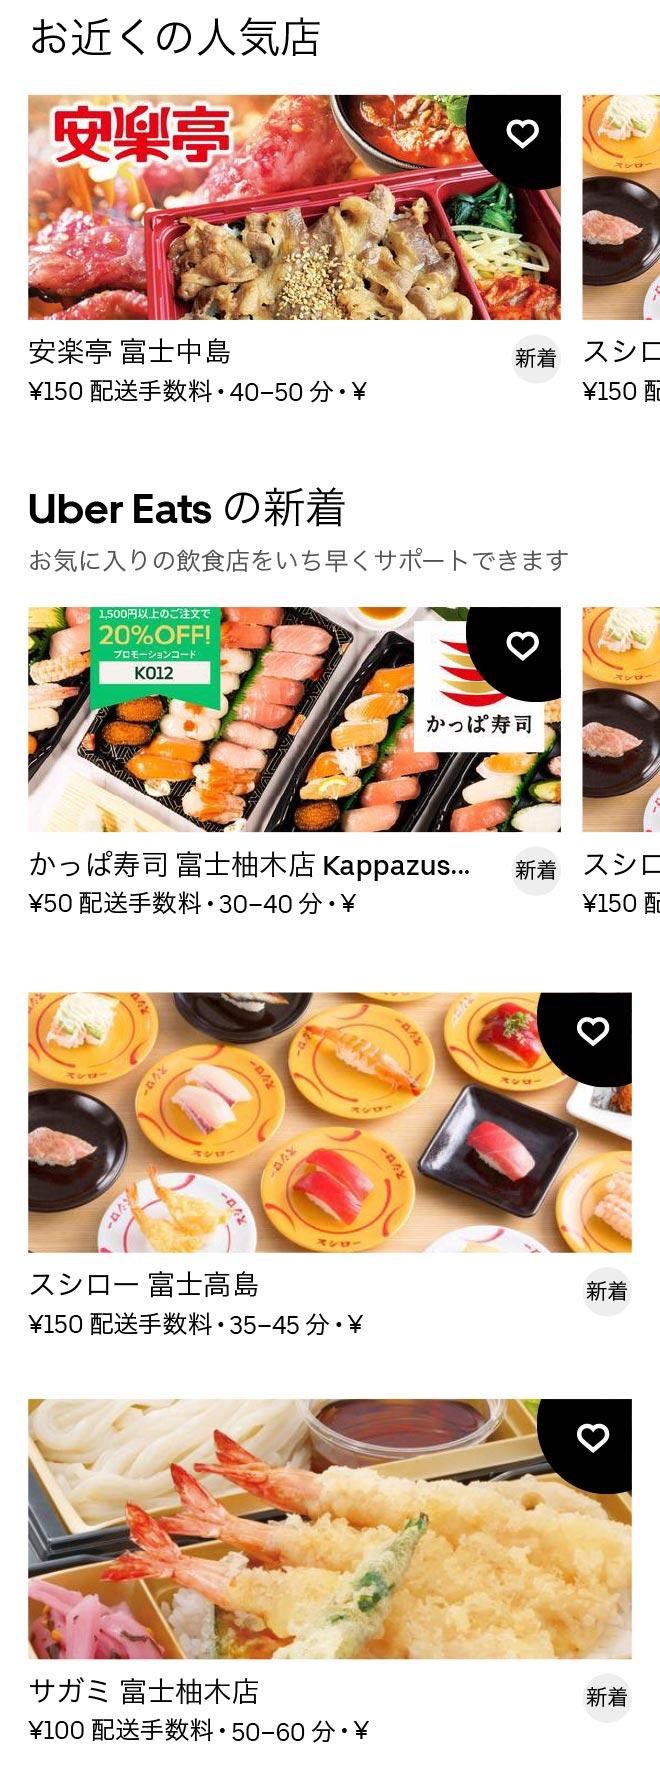 Fuji menu 2012 1